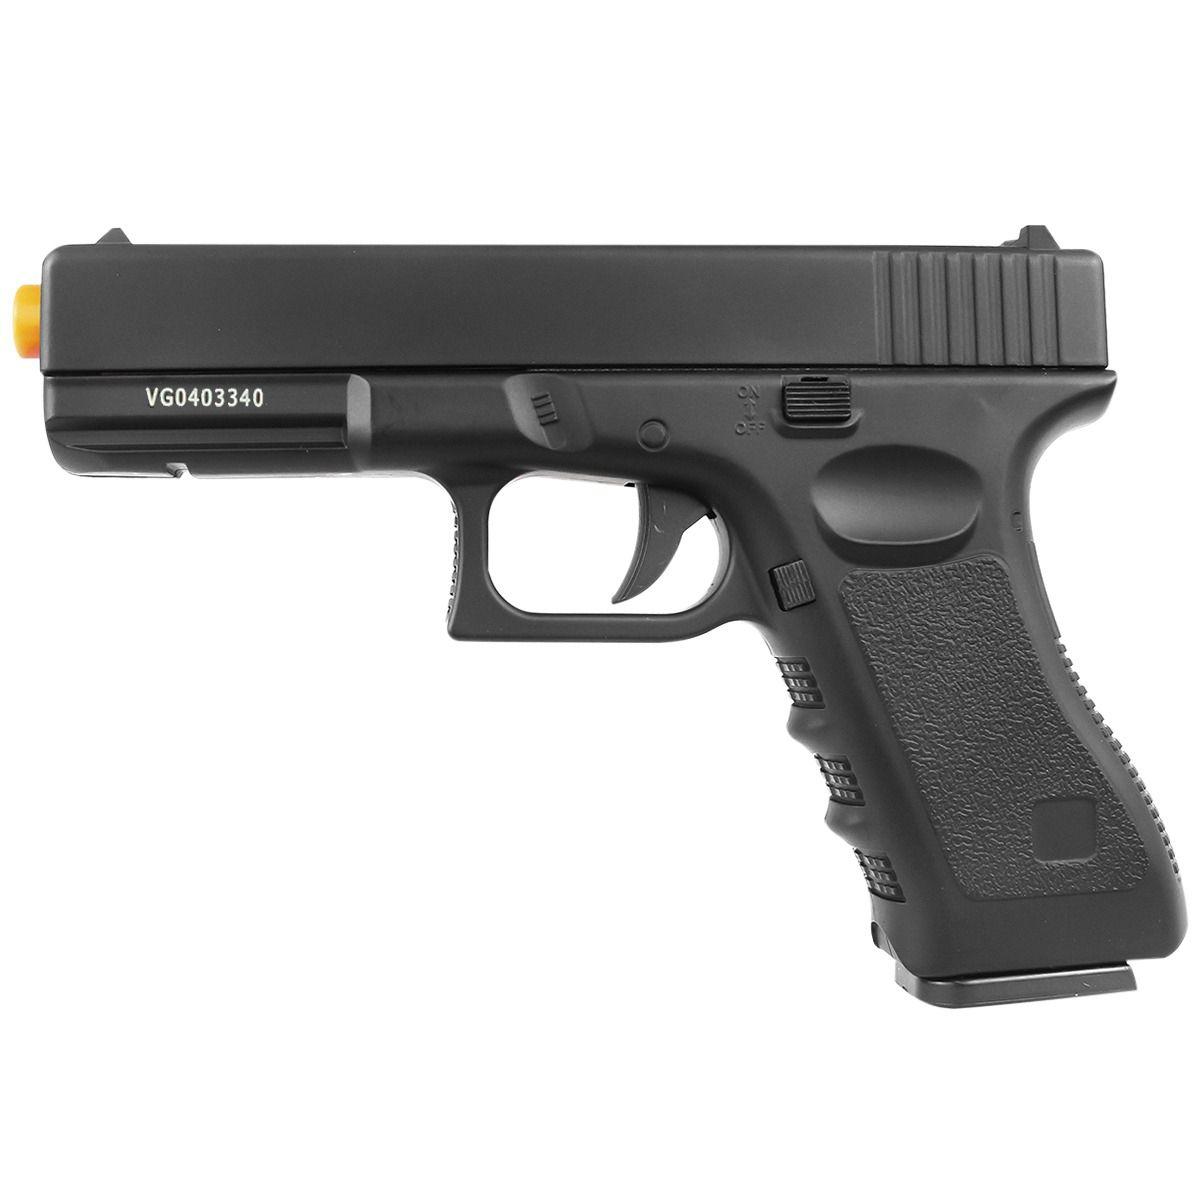 Pistola Airsoft Spring Full Metal Glock GK-V20 6mm